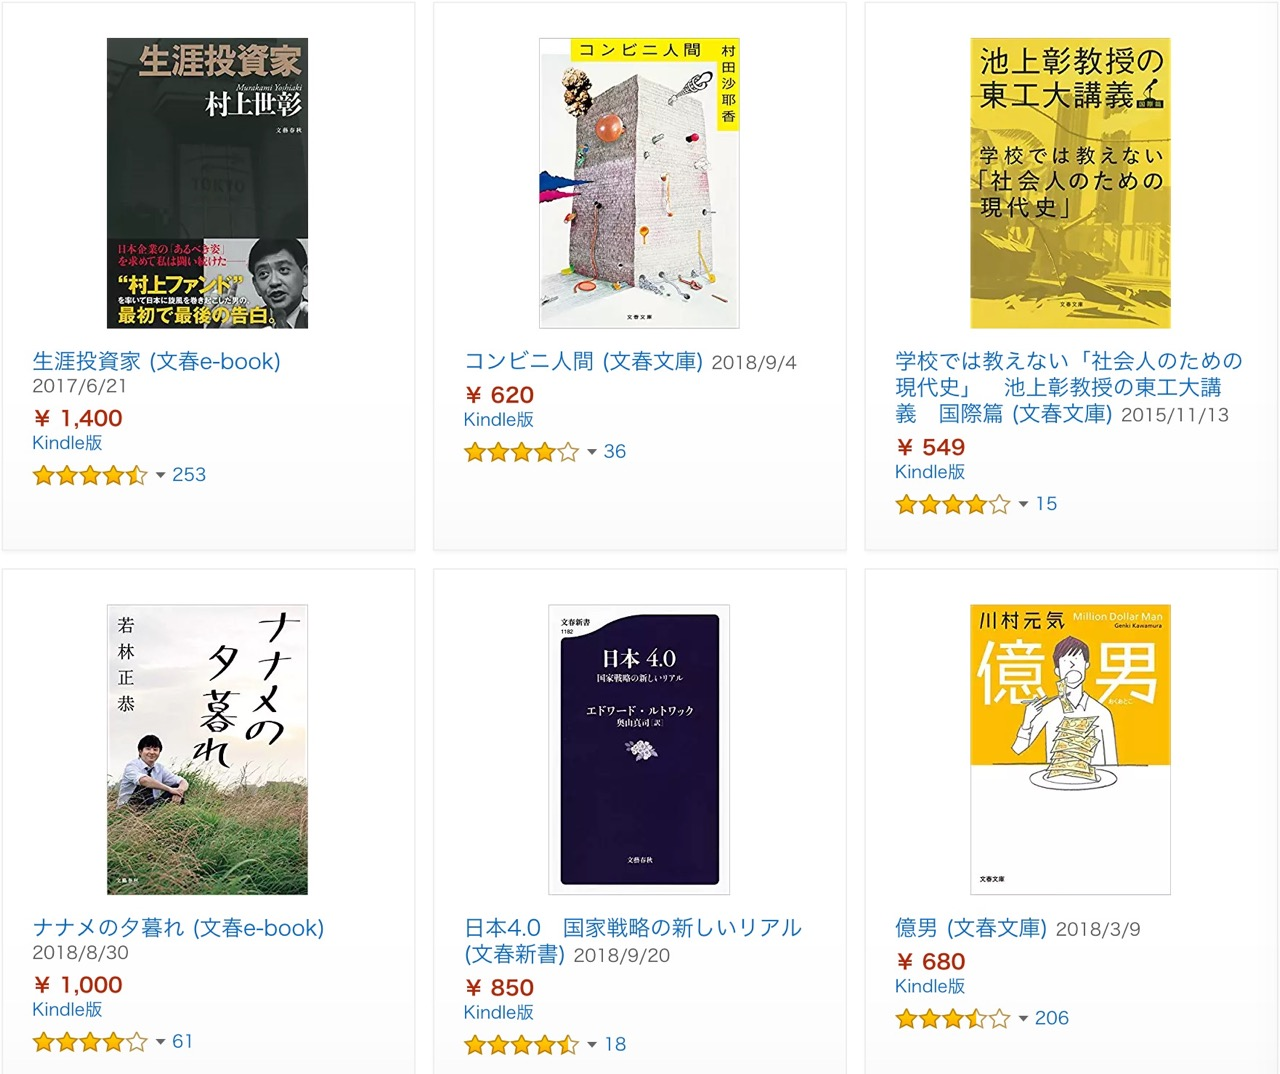 【Kindleセール】全点50%ポイント還元「文春祭り」(11/8まで)